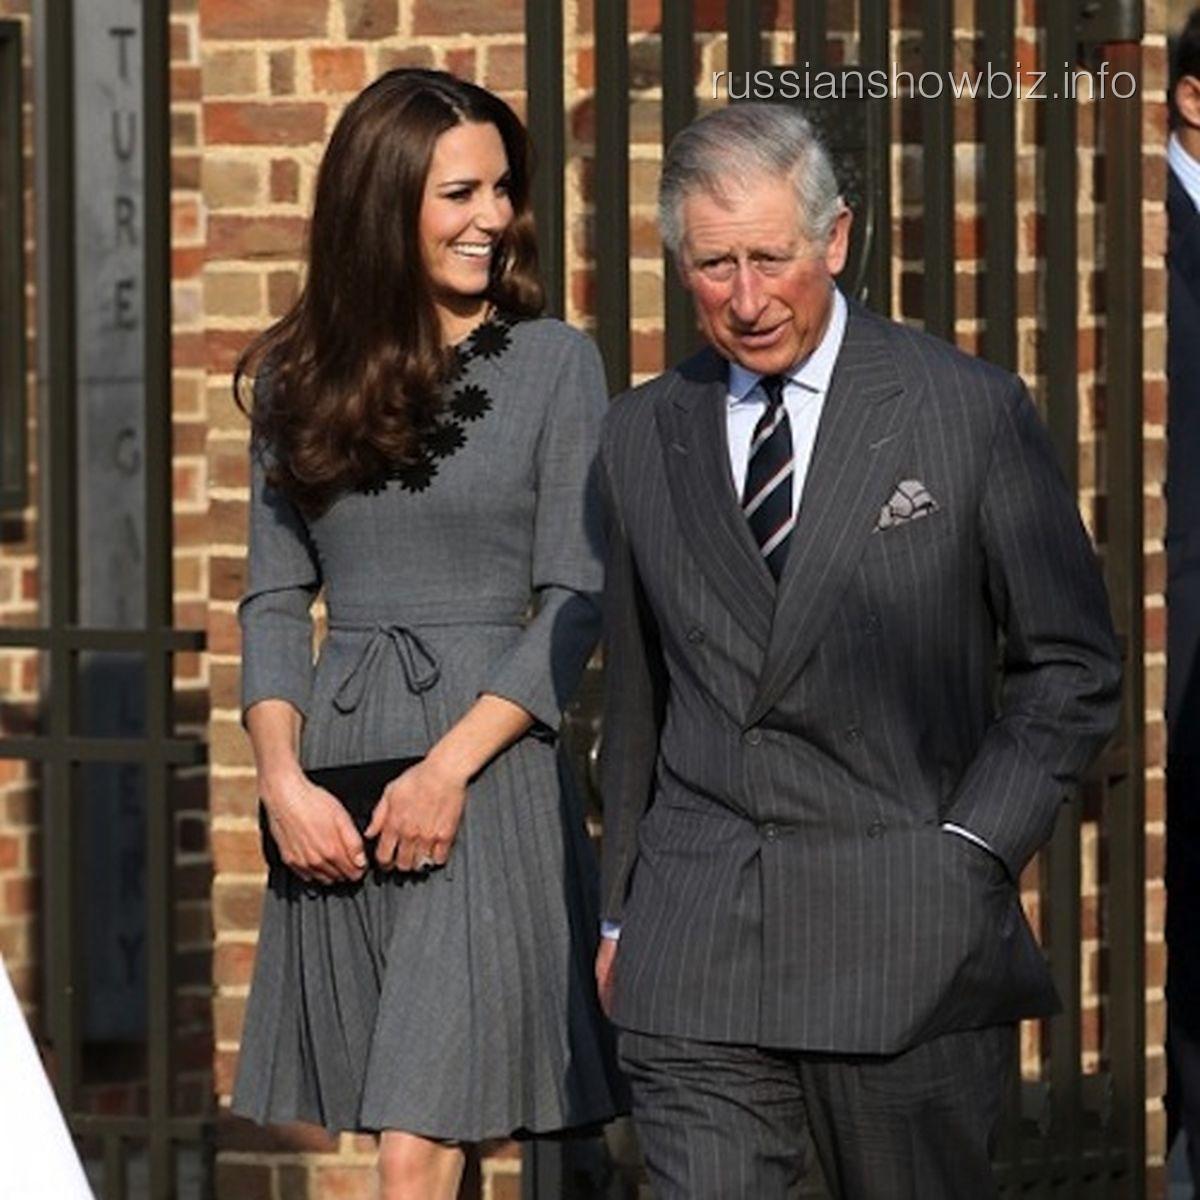 Кейт Миддлтон и принц Чарльз